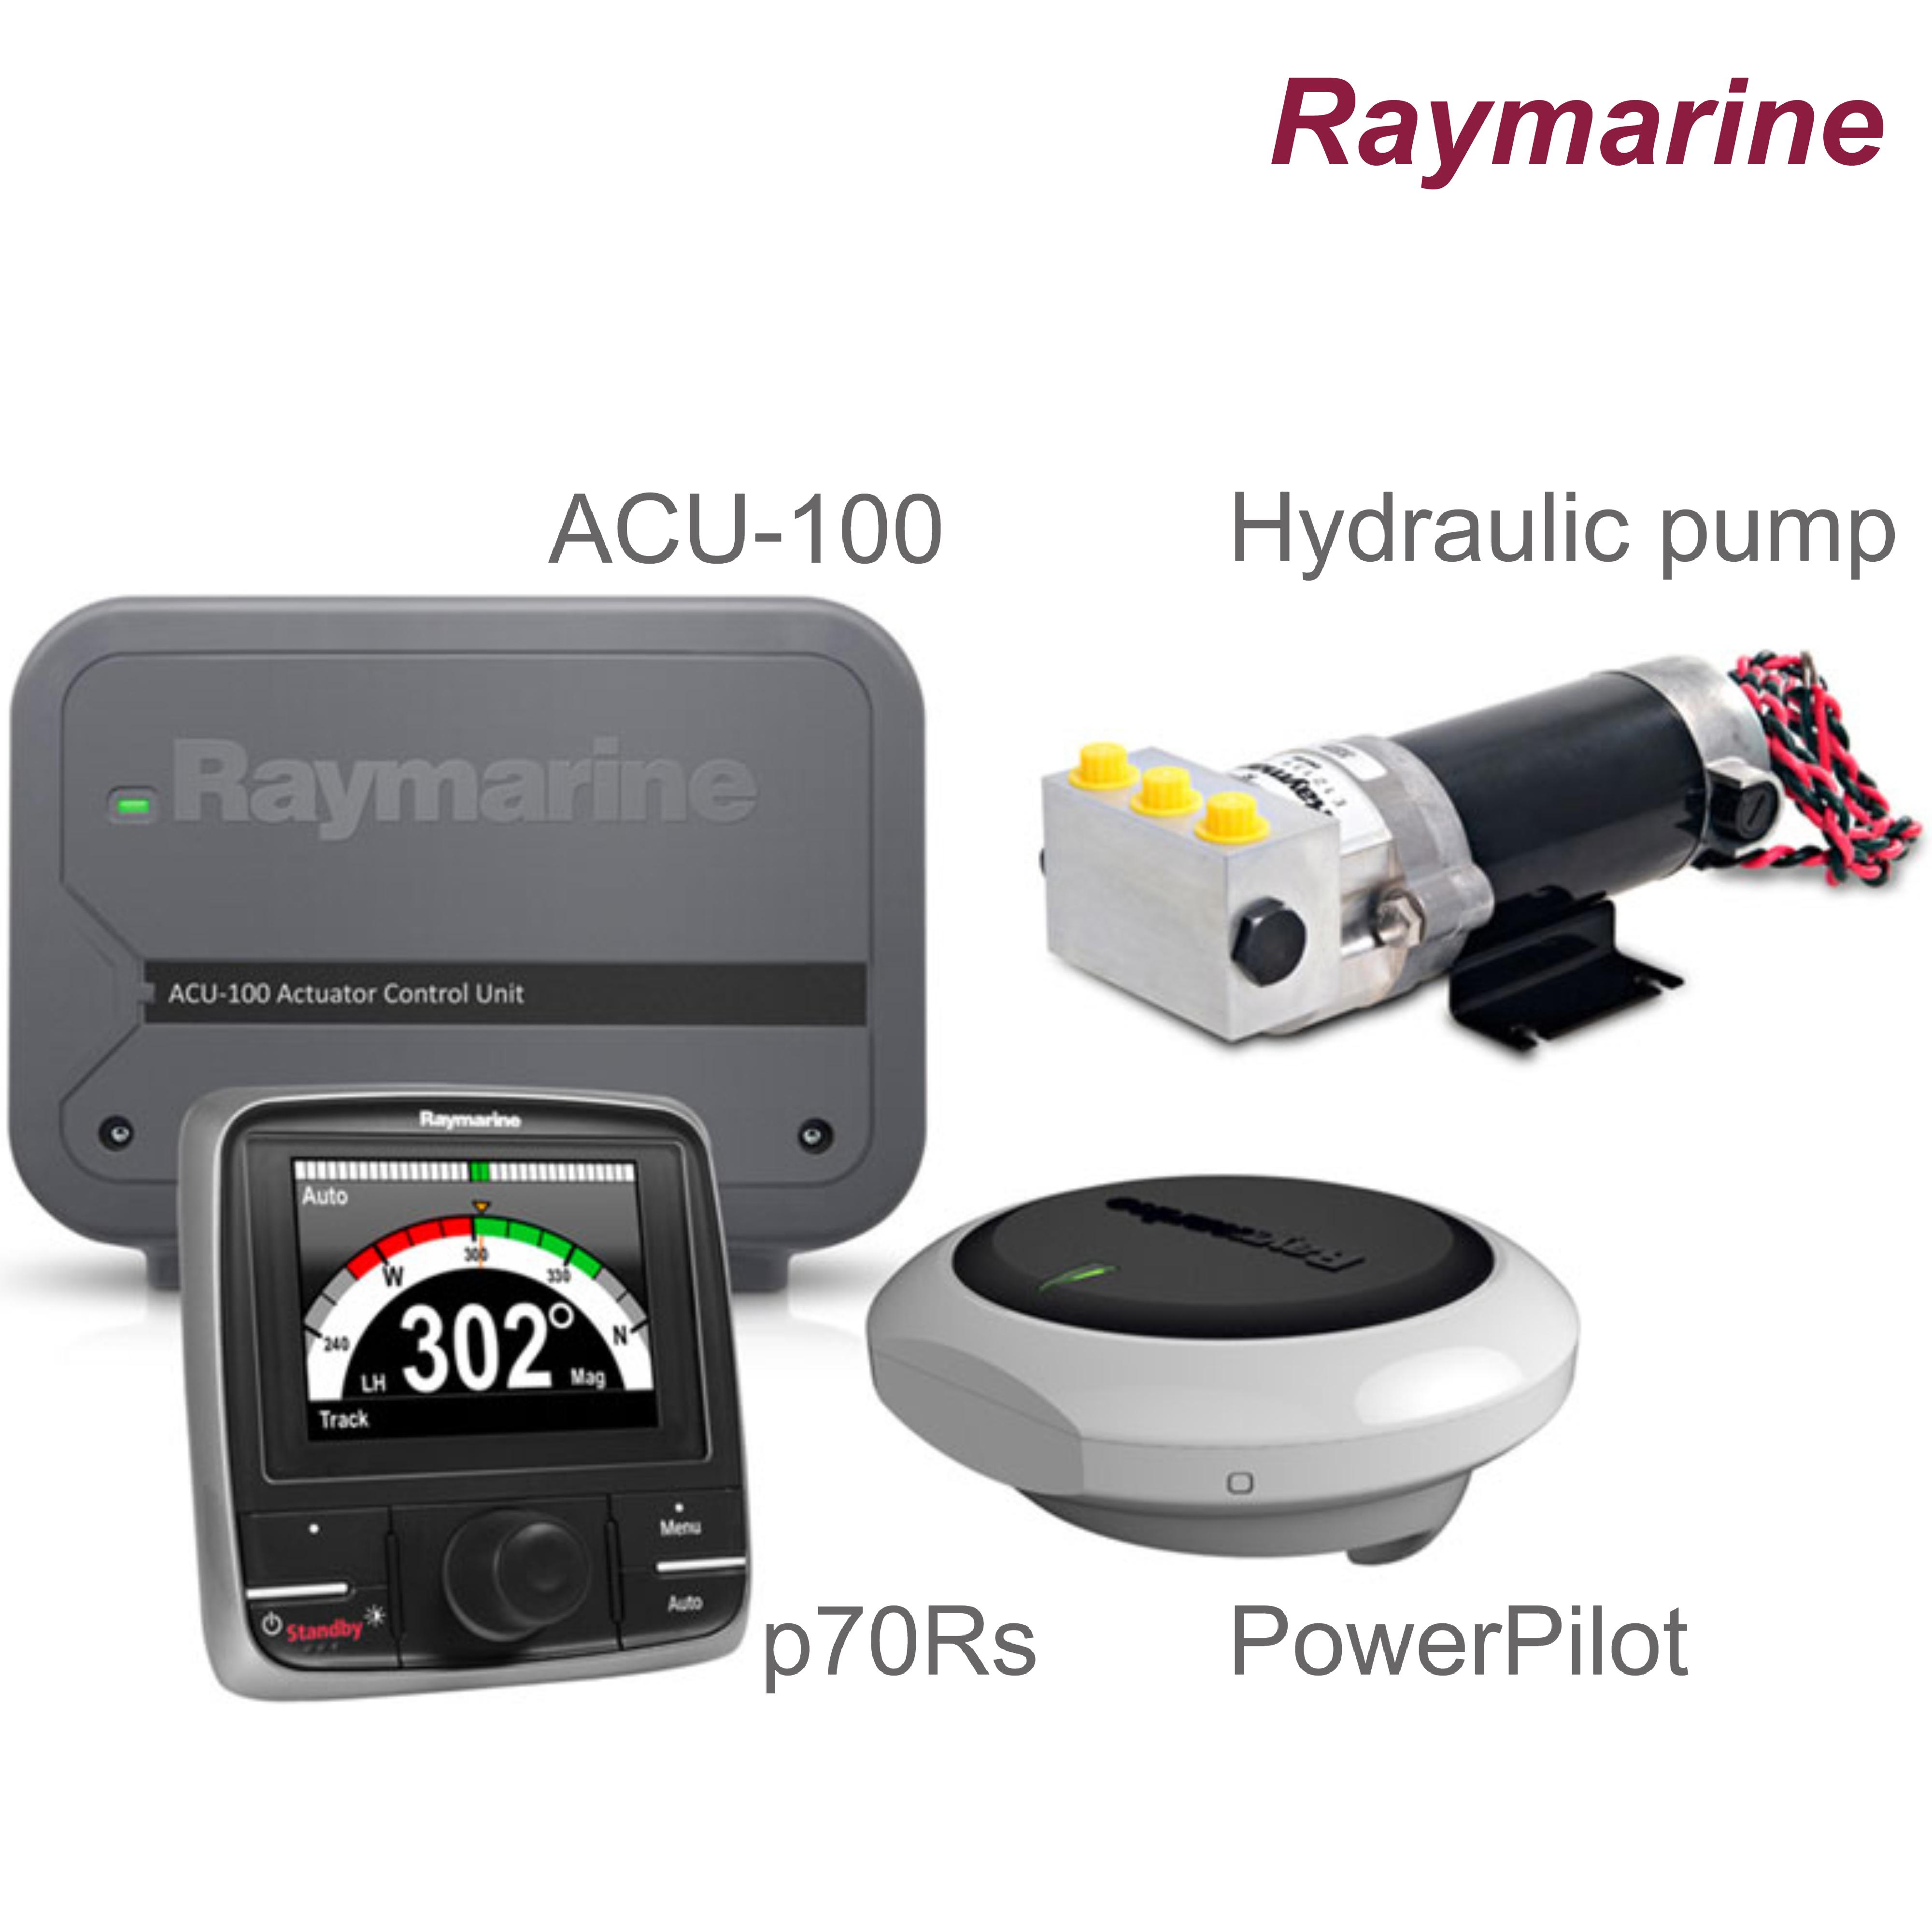 Raymarine-T70154 Evolution PowerPilot Control Head 0.5l Hydraulic Pump In Marine